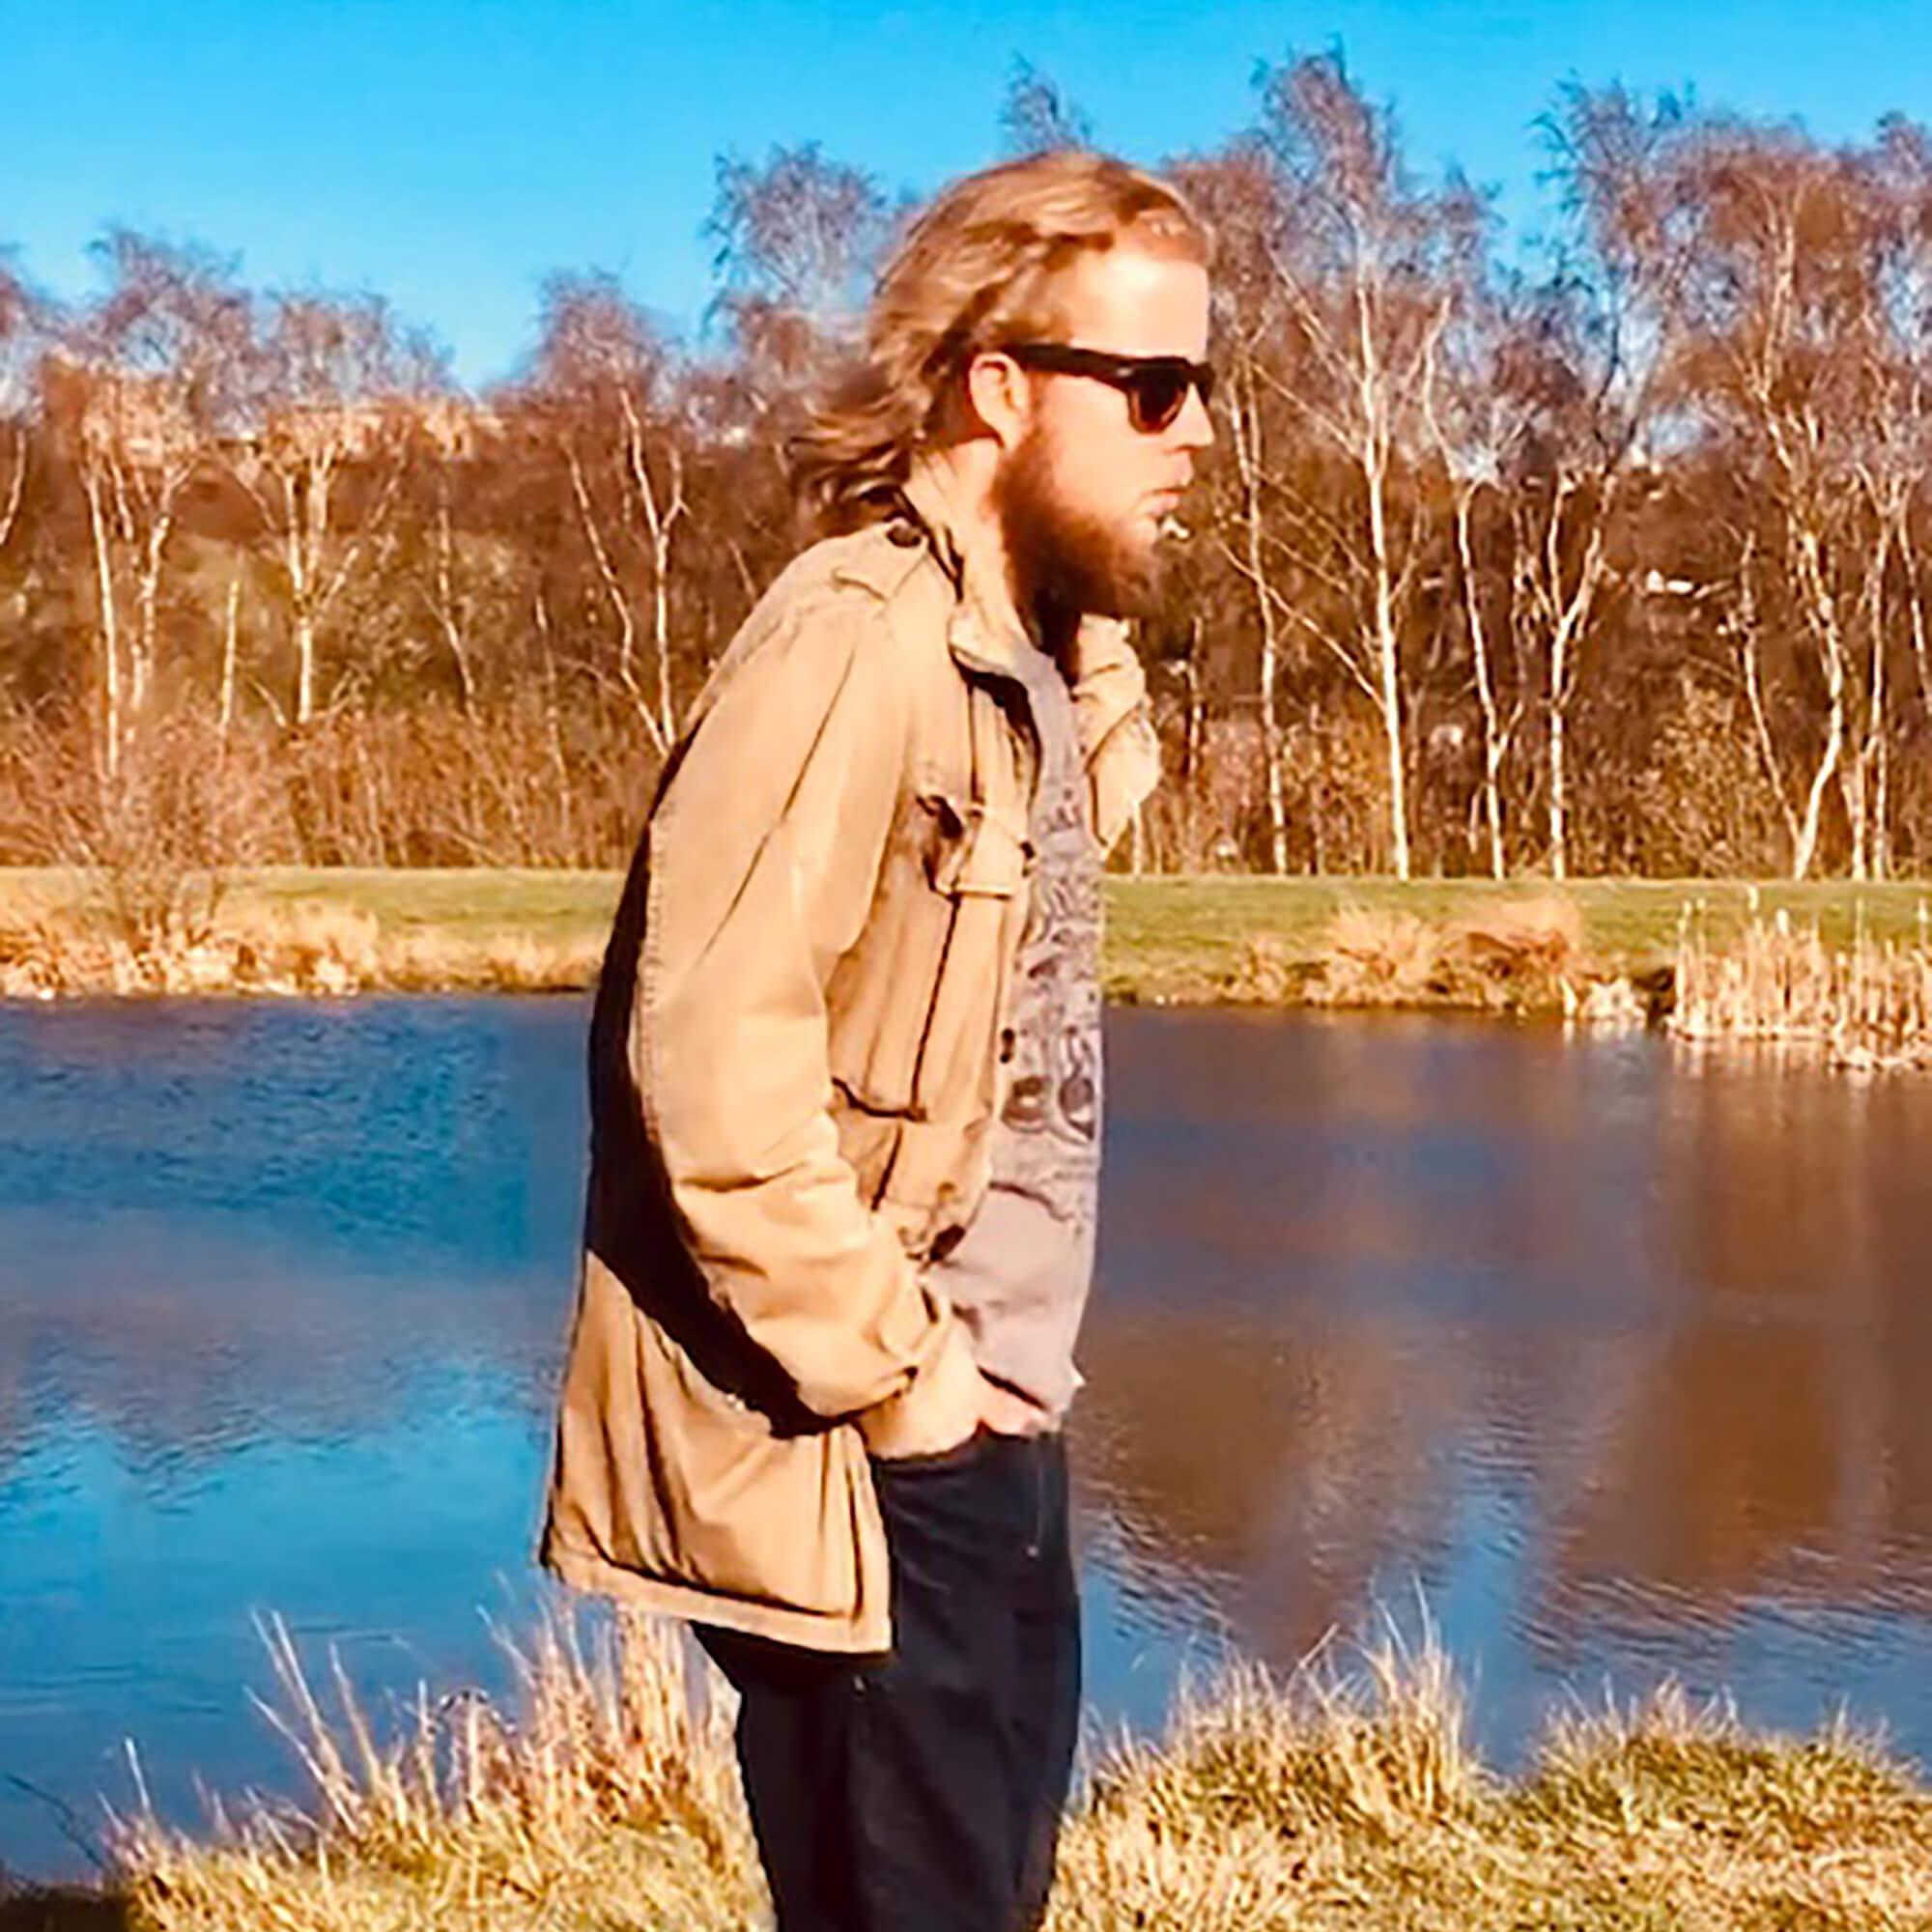 Ryan wearing sunglasses standing by a lake.